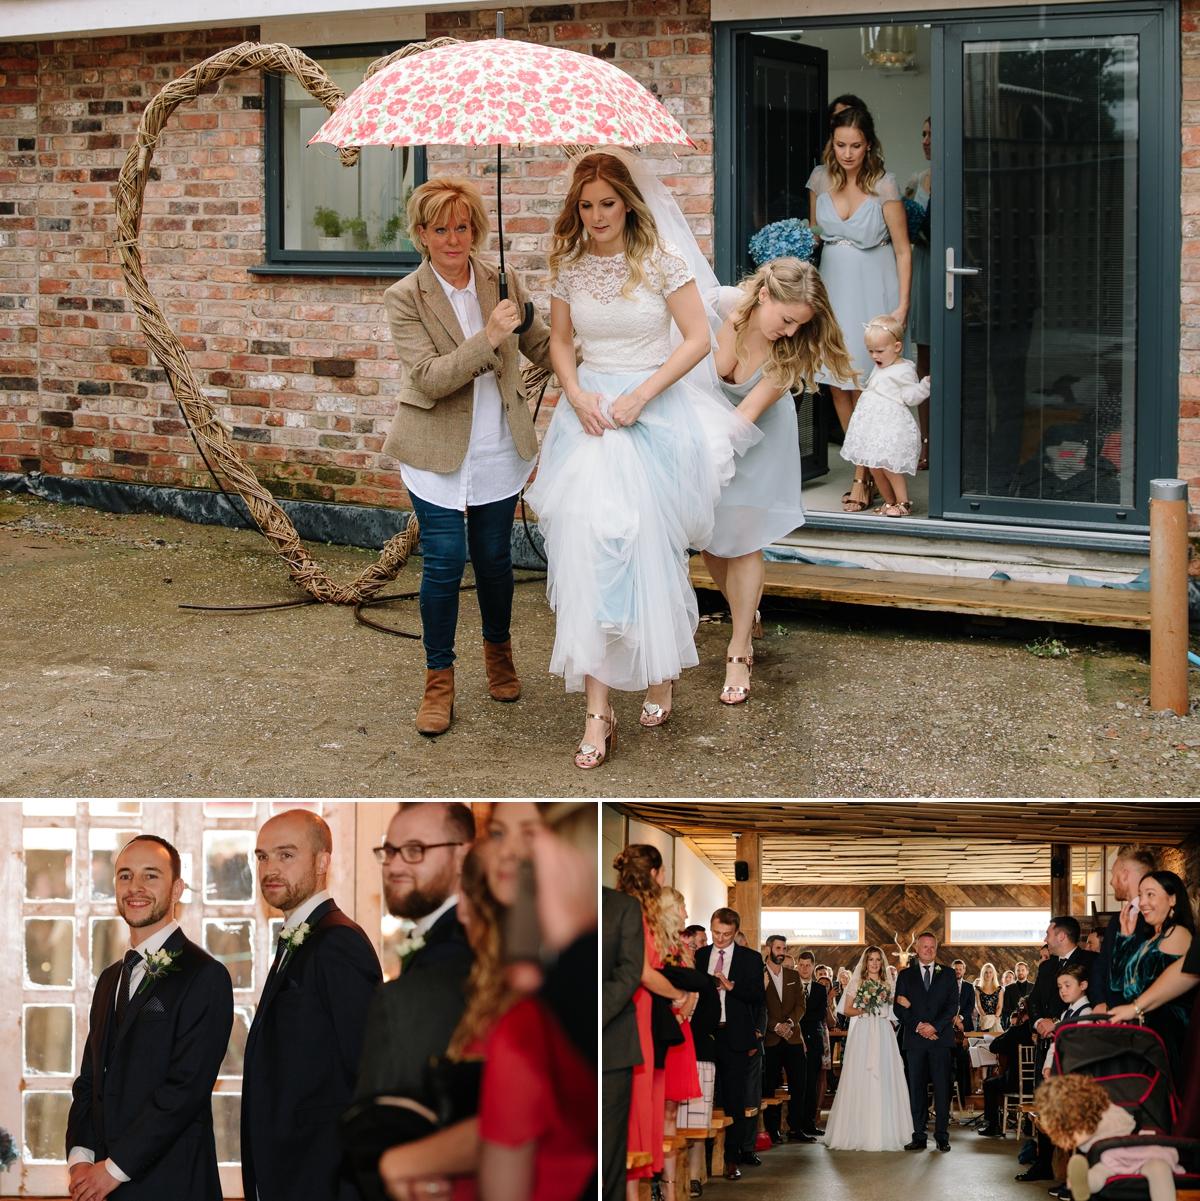 Wet wedding - bride with an umberella